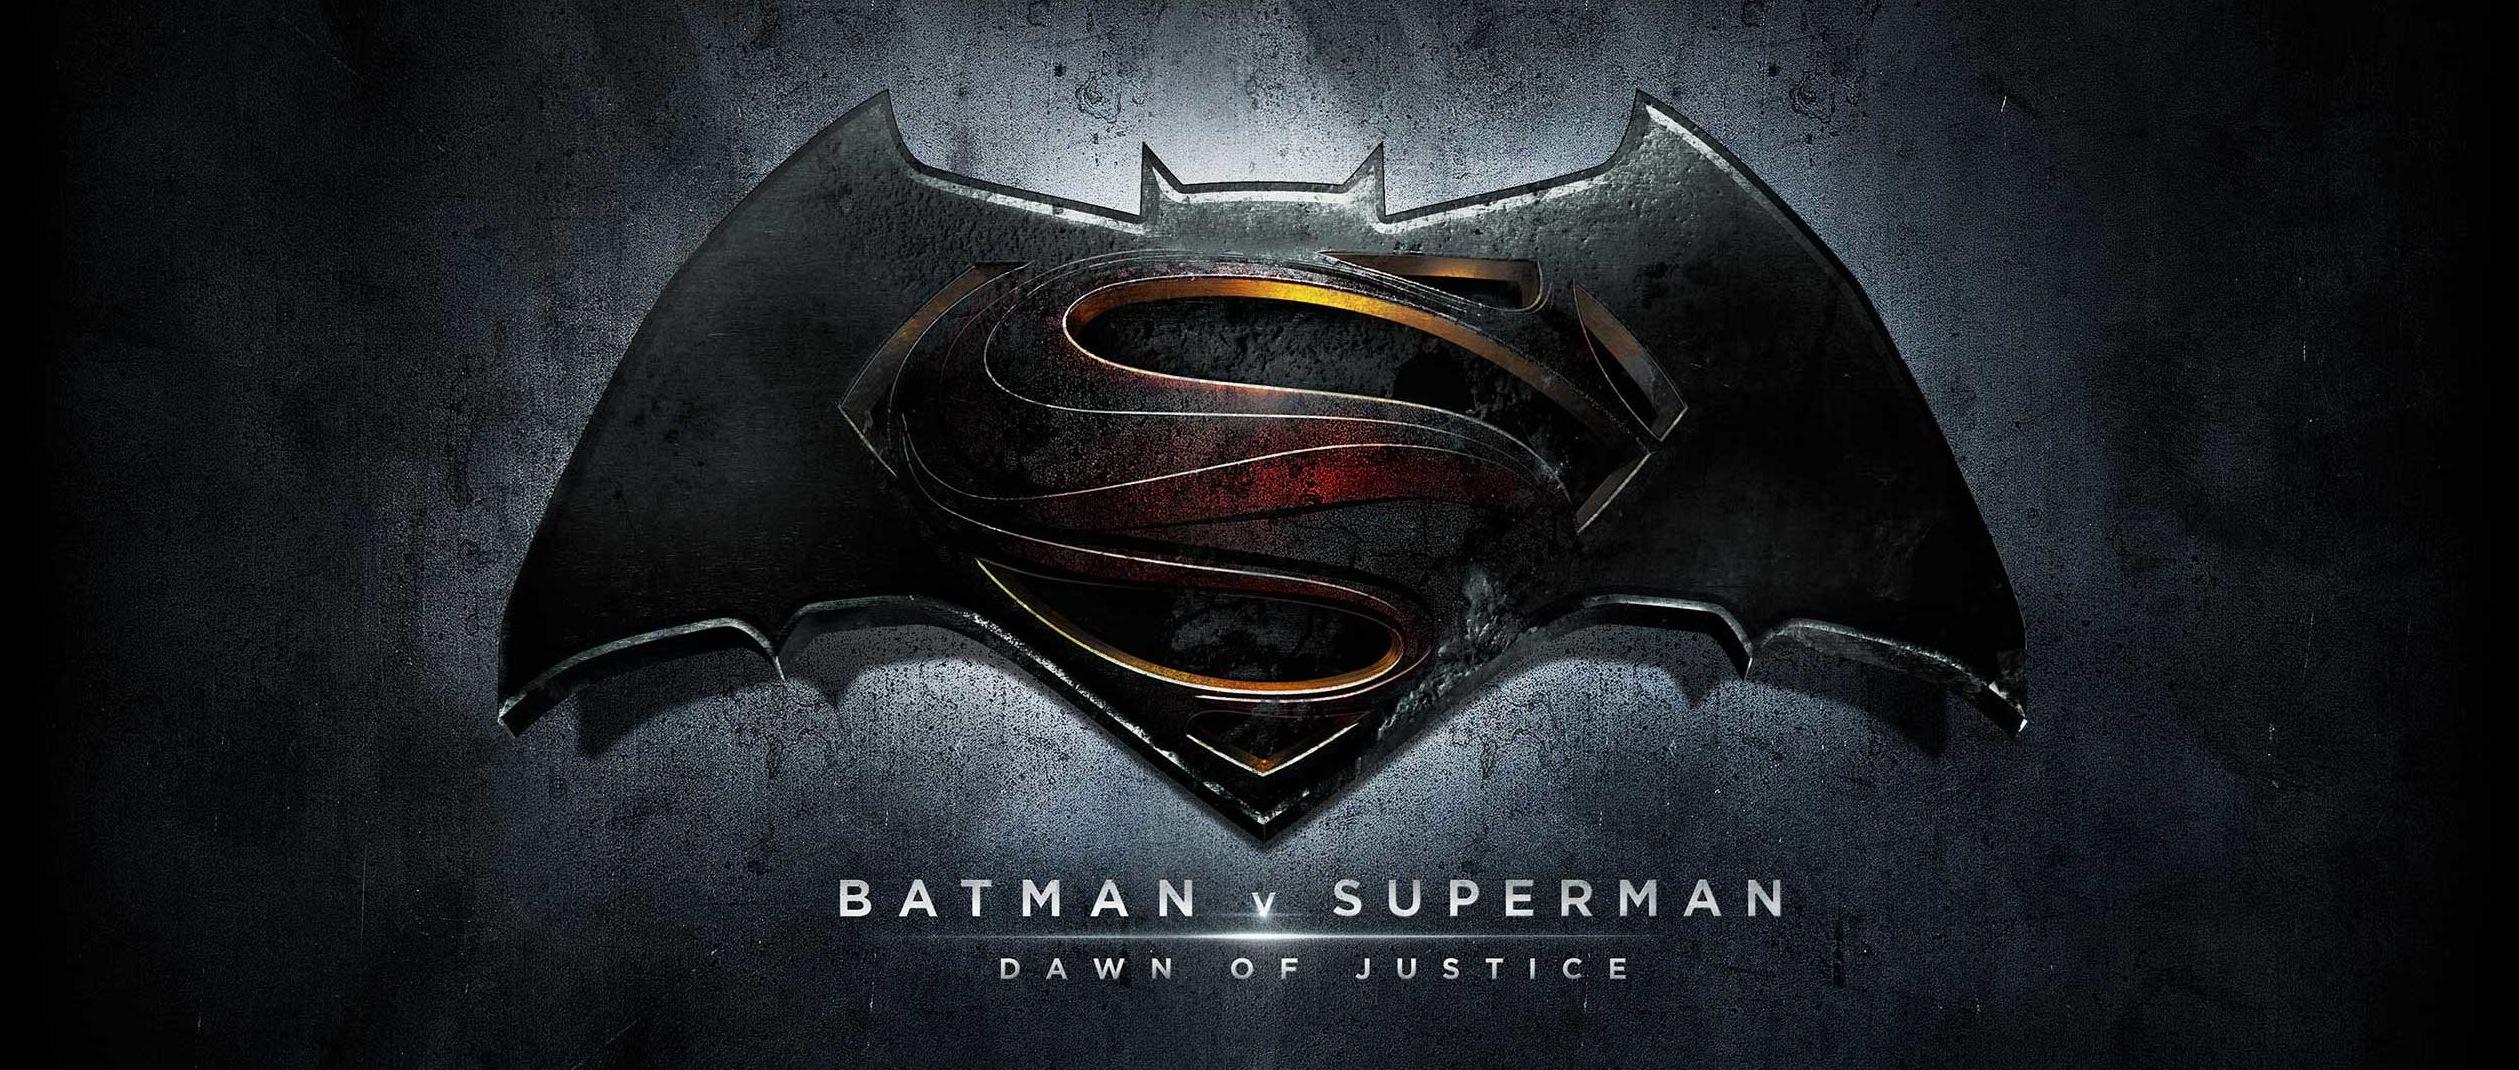 doj-is-batman-v-superman-dawn-of-justice-too-crowded